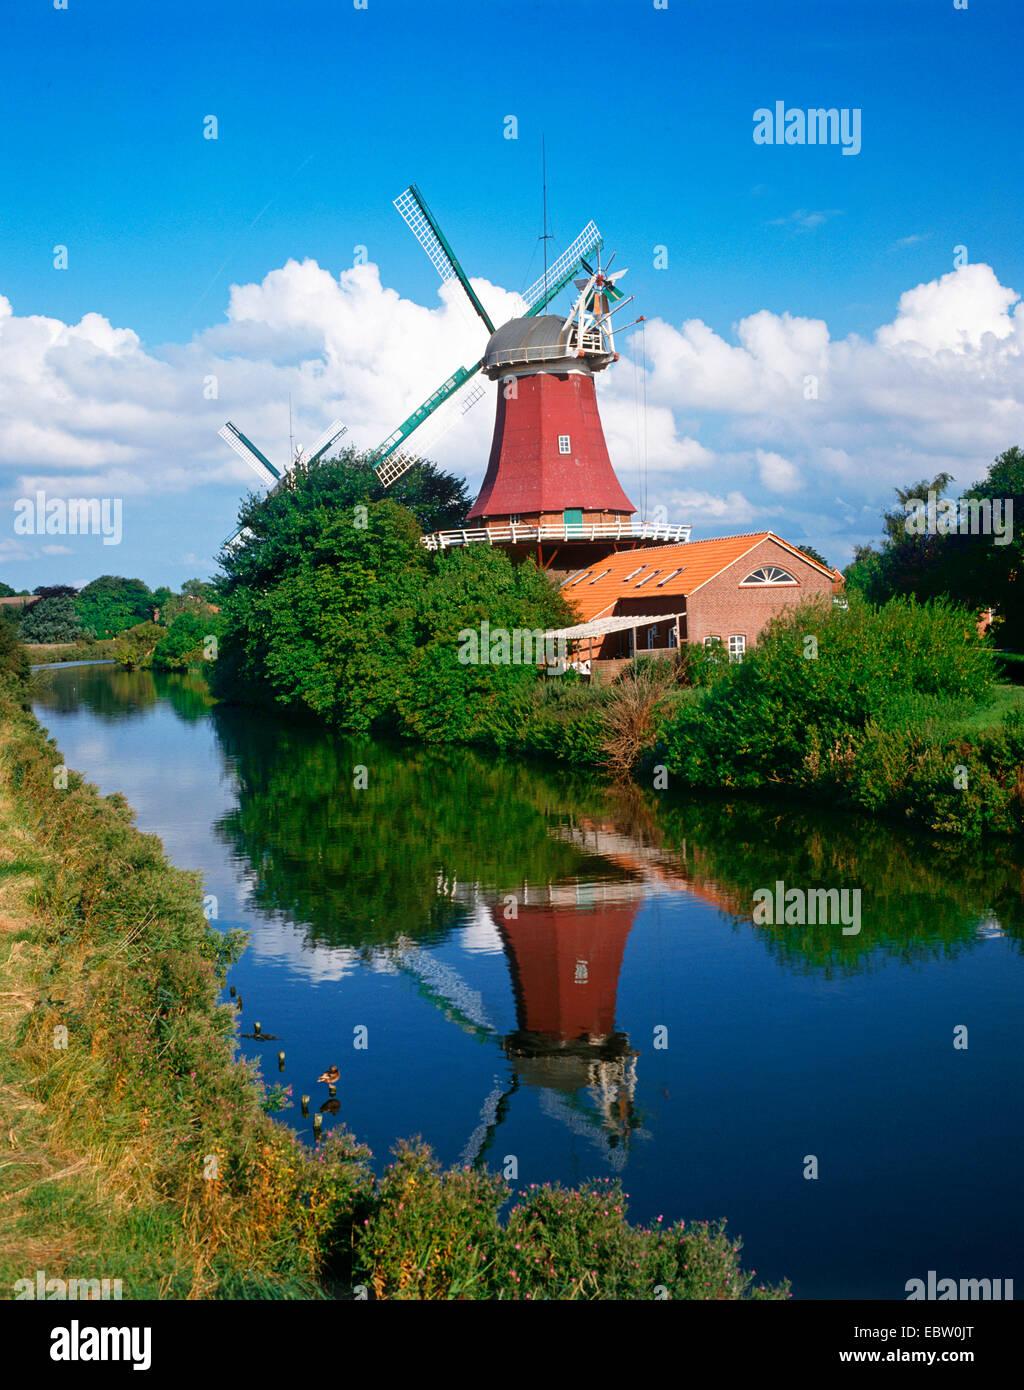 twin mills of Greetsiel, Germany, Lower Saxony, East Frisia, Greetsiel - Stock Image